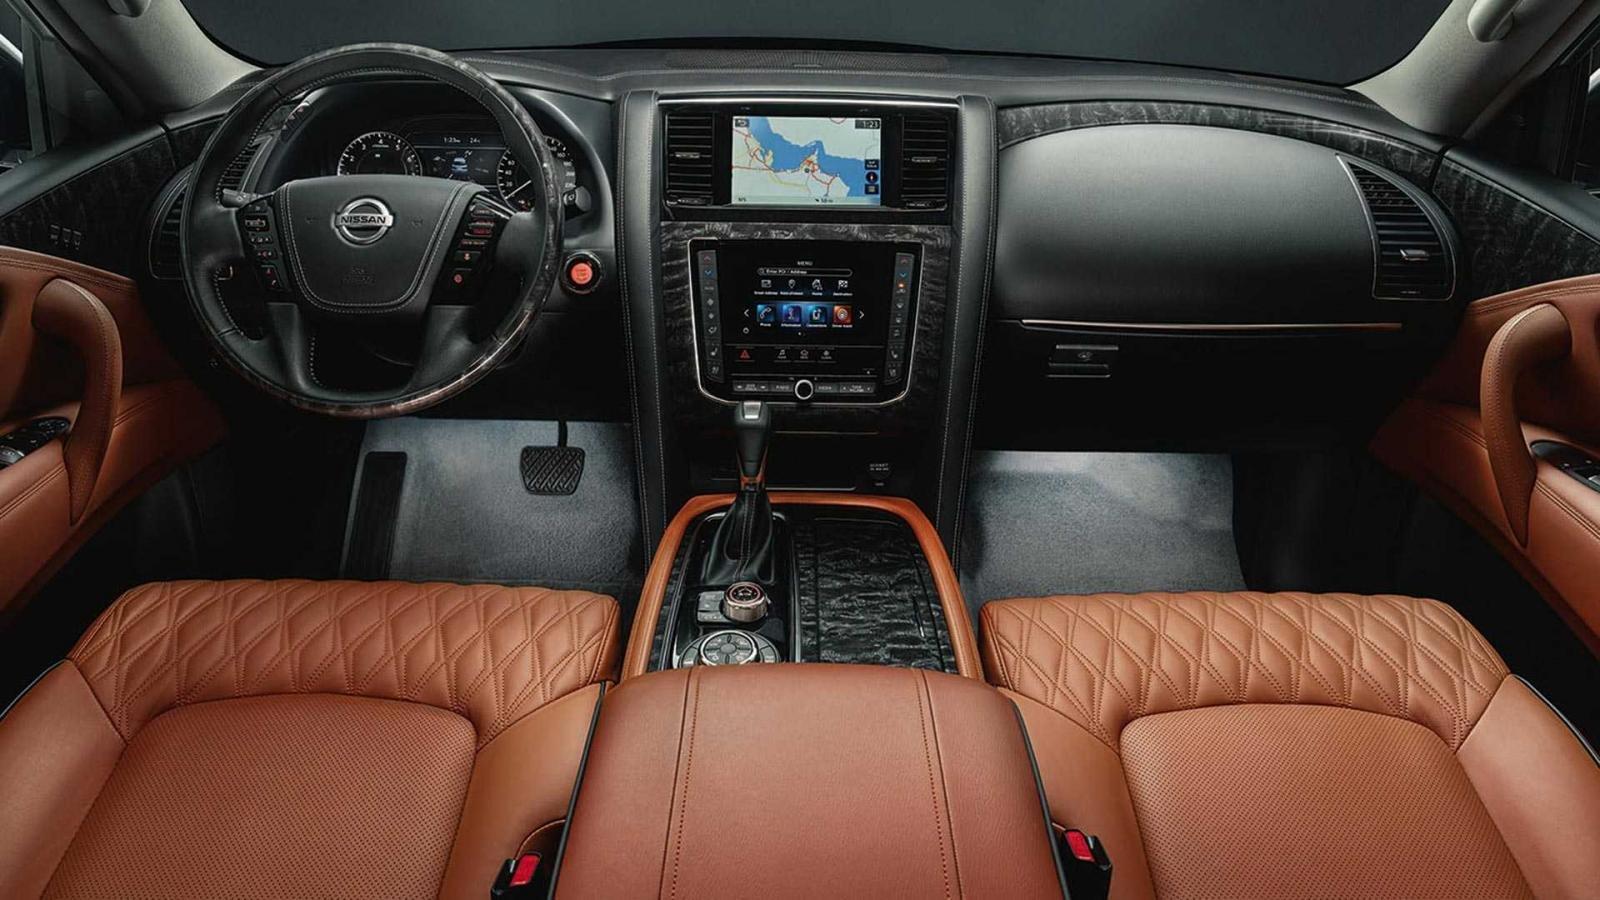 2021 Nissan Patrol interior view